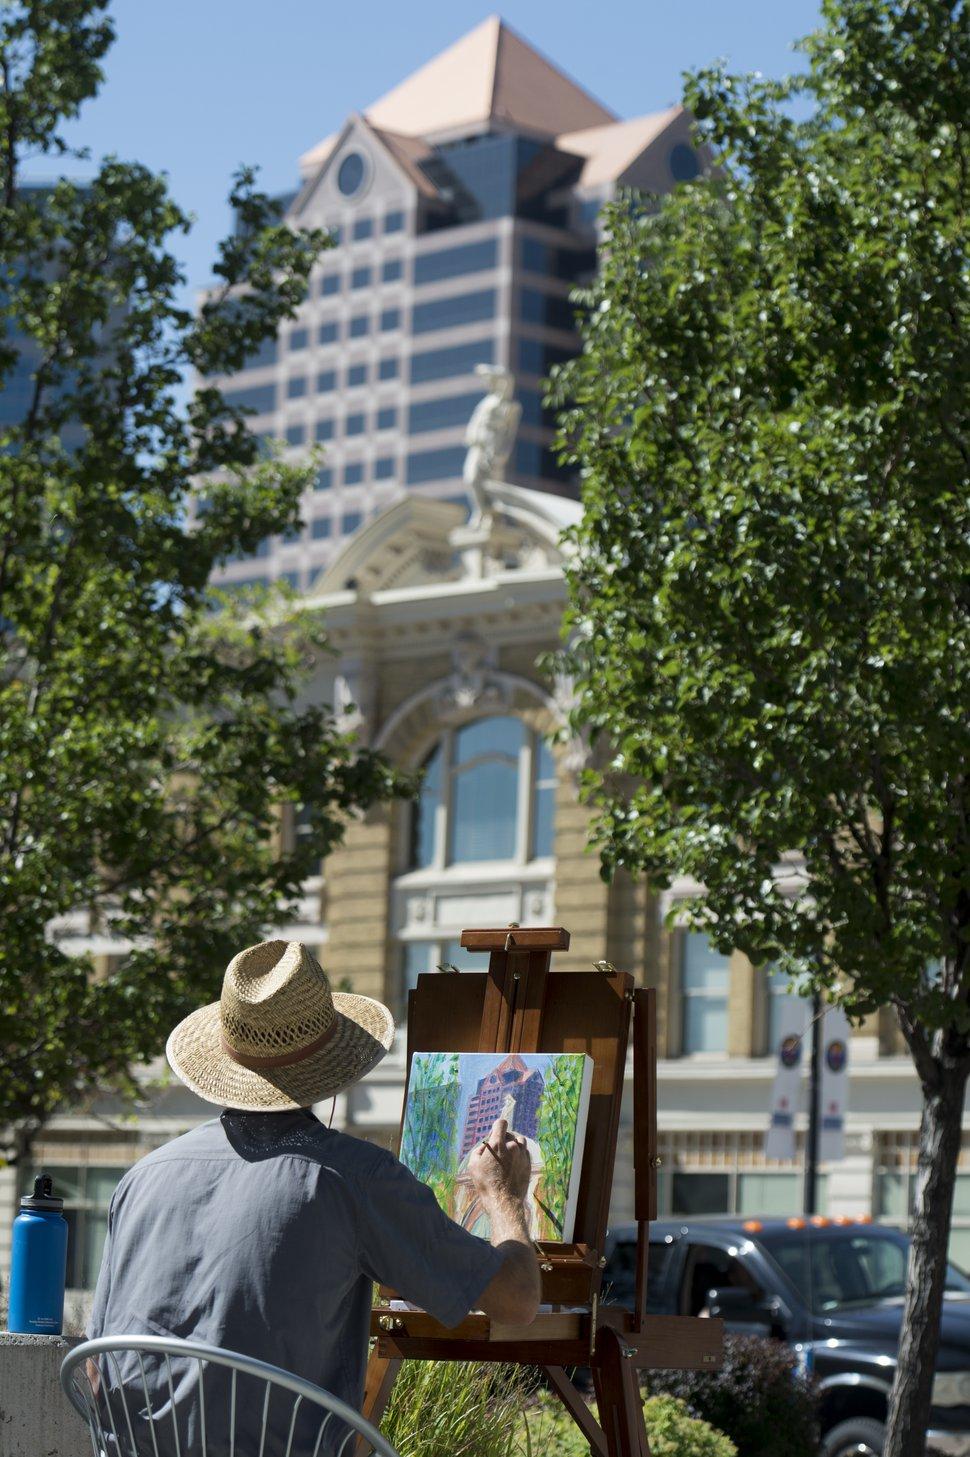 (Rick Egan | The Salt Lake Tribune) Albert Wint paints in front of the Federal Building as part of The Blocks Urban Plein Air Festival.